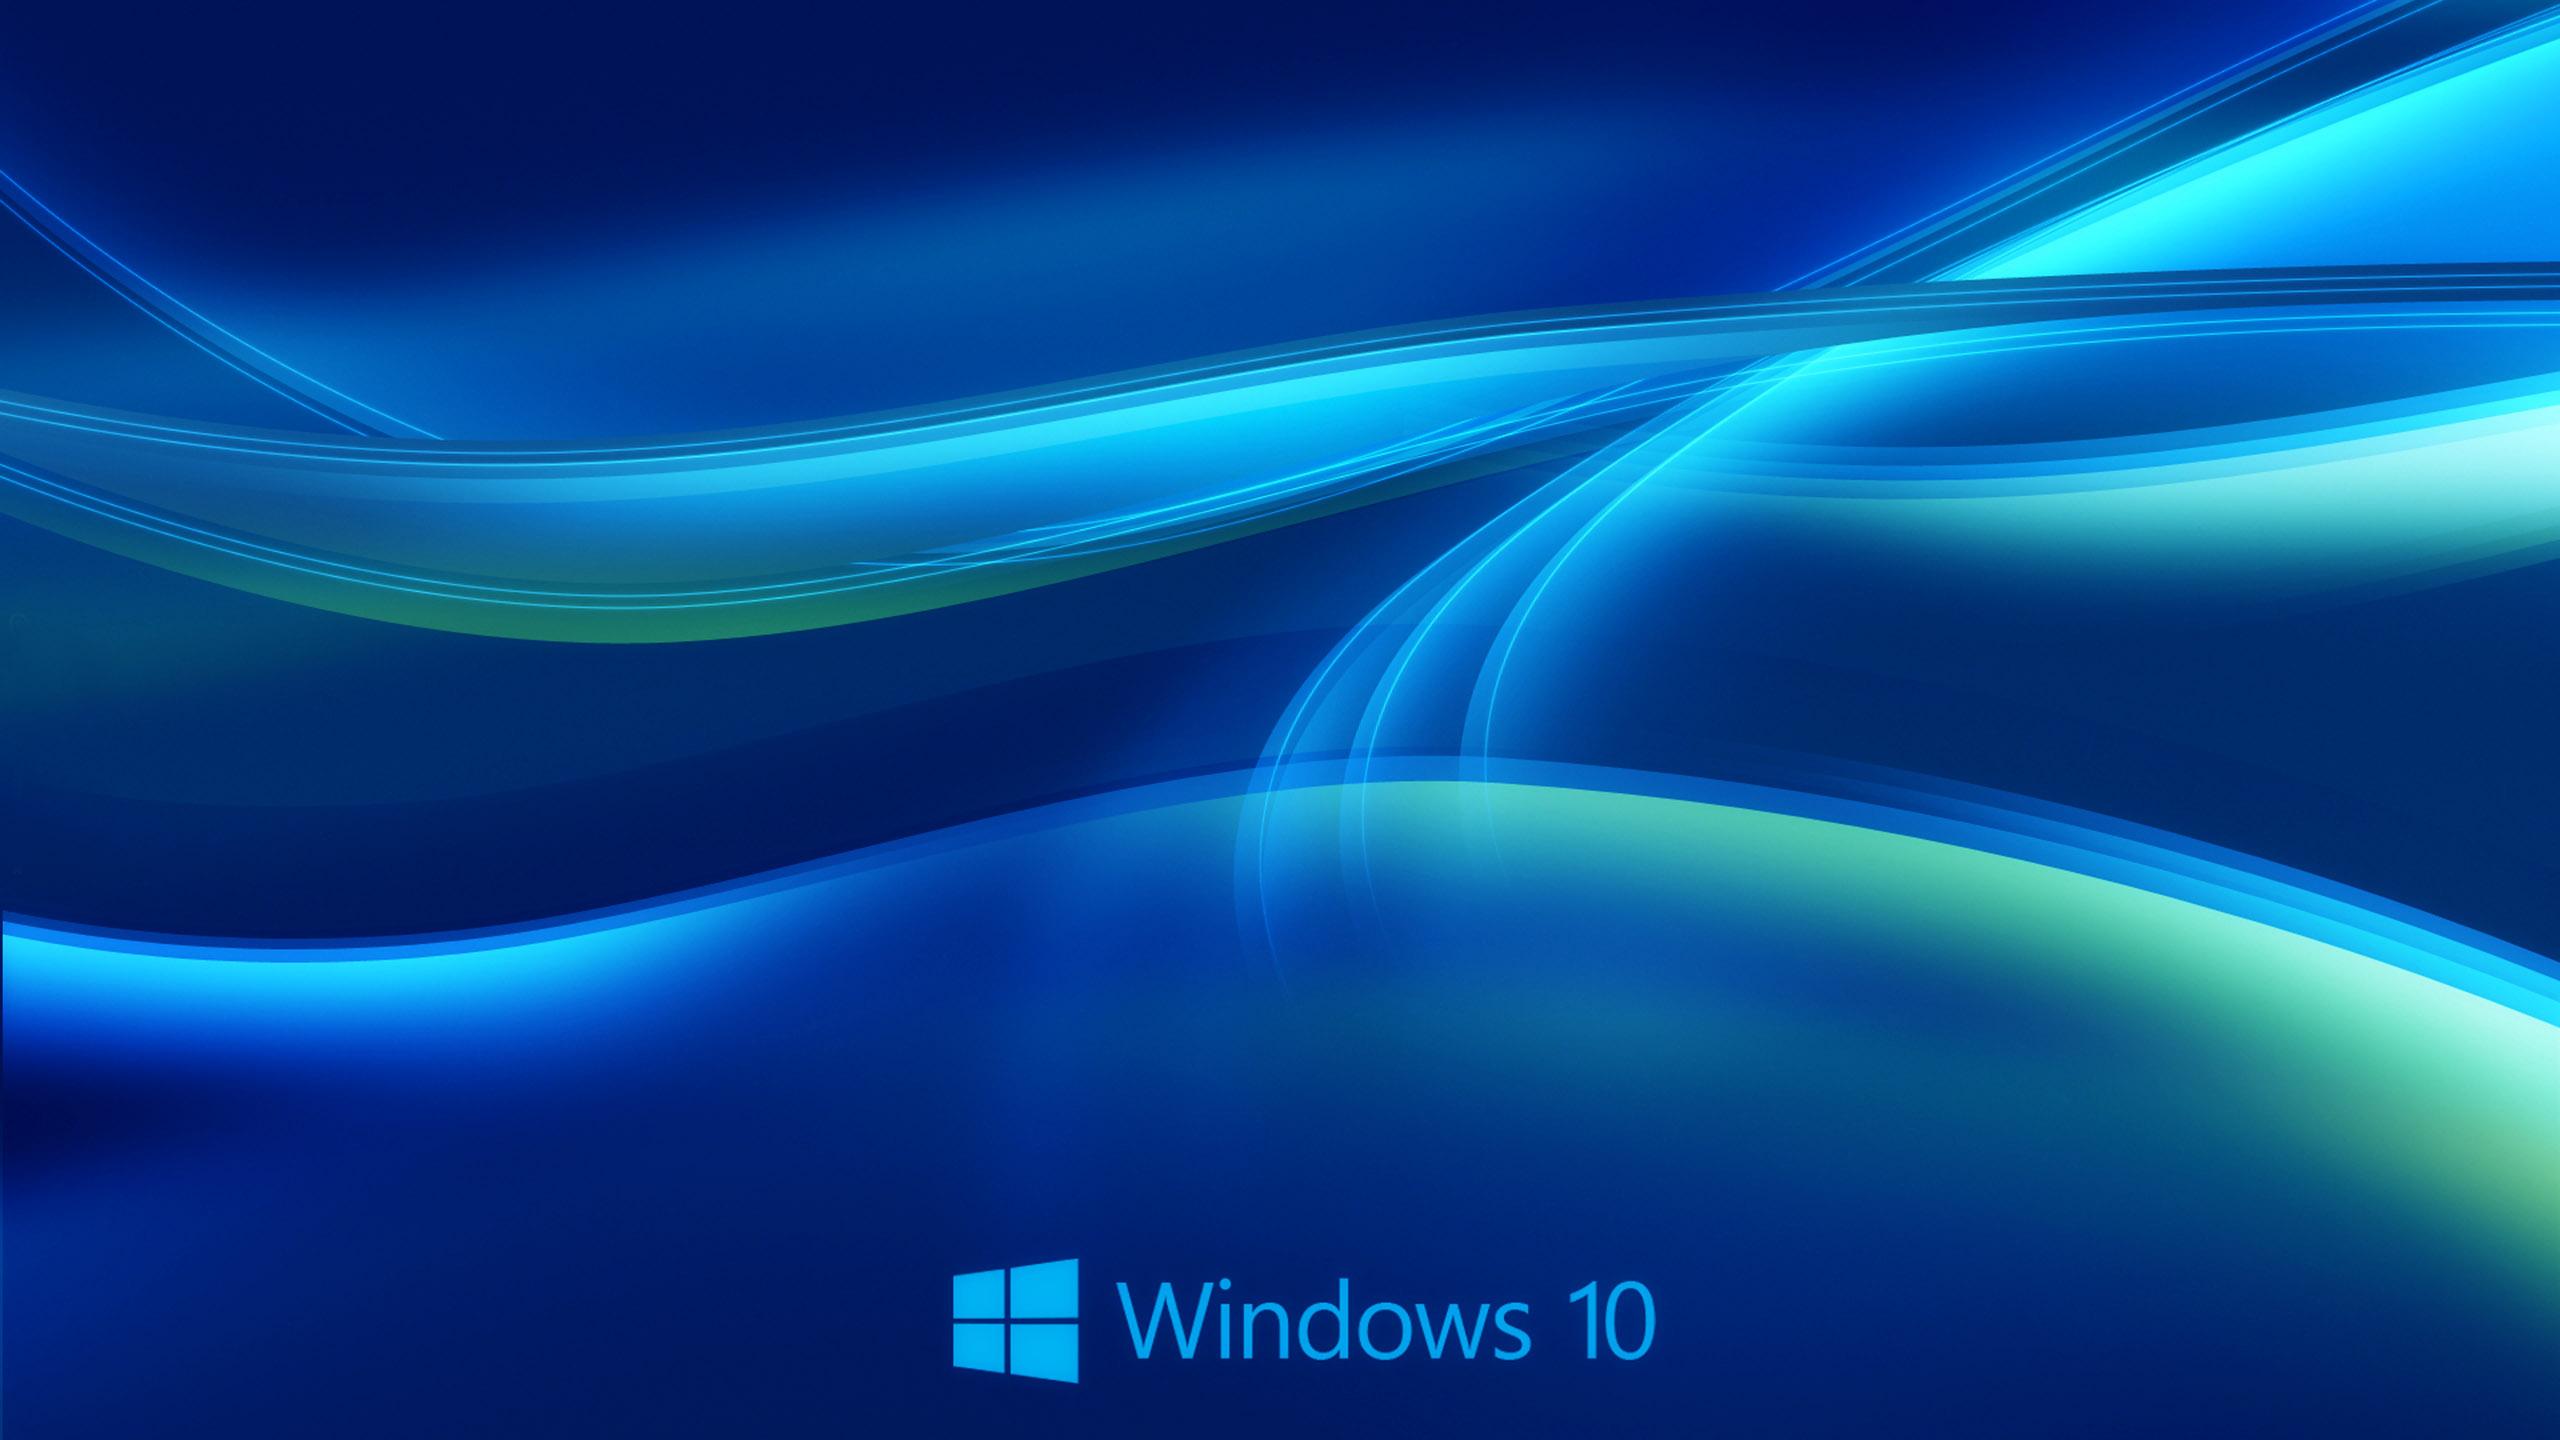 48 Naruto Wallpaper For Windows 10 On Wallpapersafari